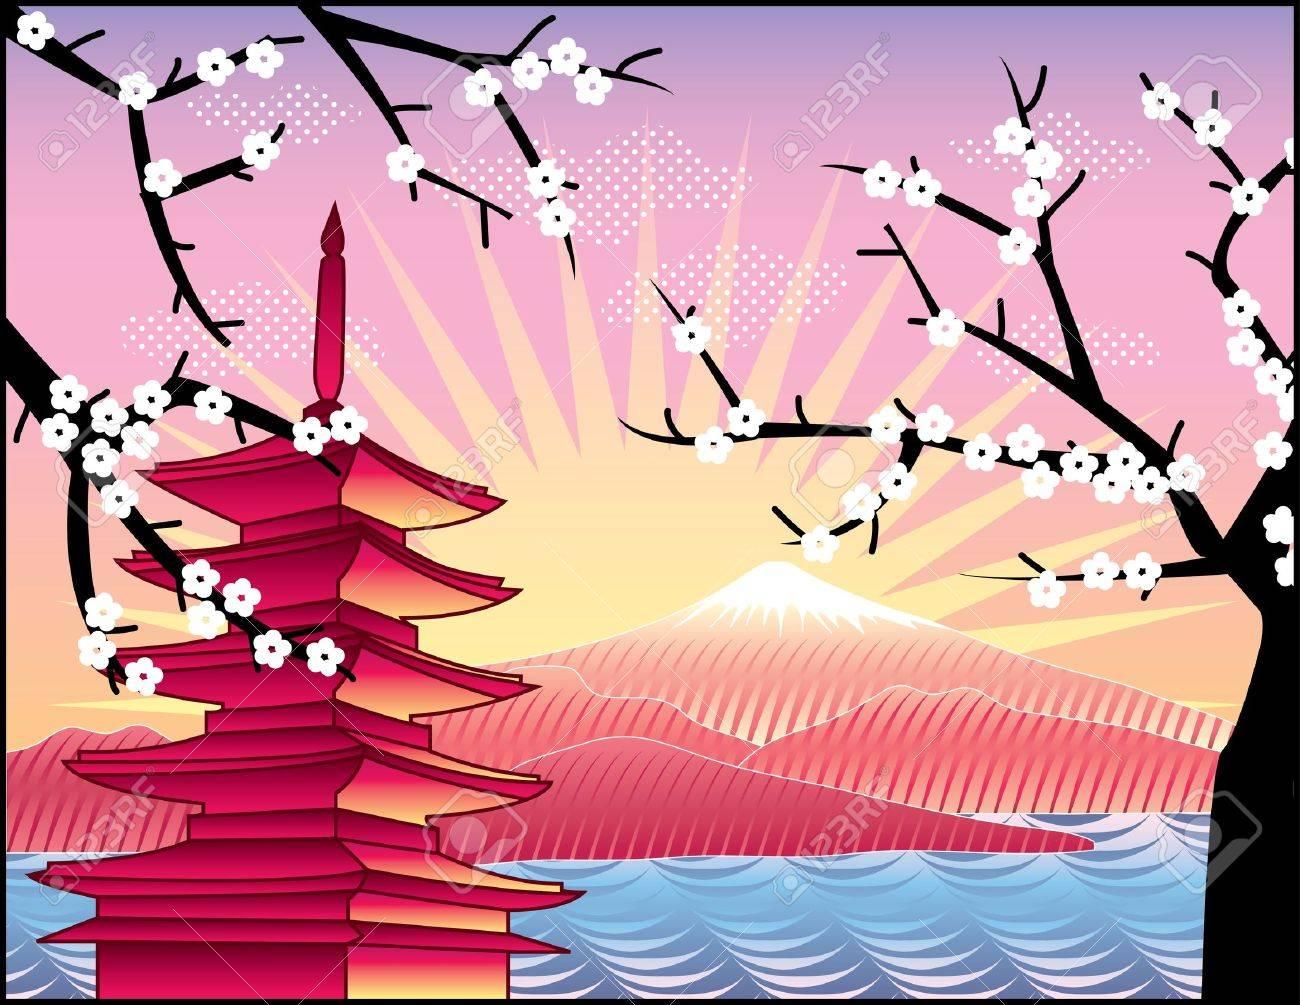 landscape with Fuji mount, sakura tree and Japan   pagoda illustration in original style Stock Vector - 12834677